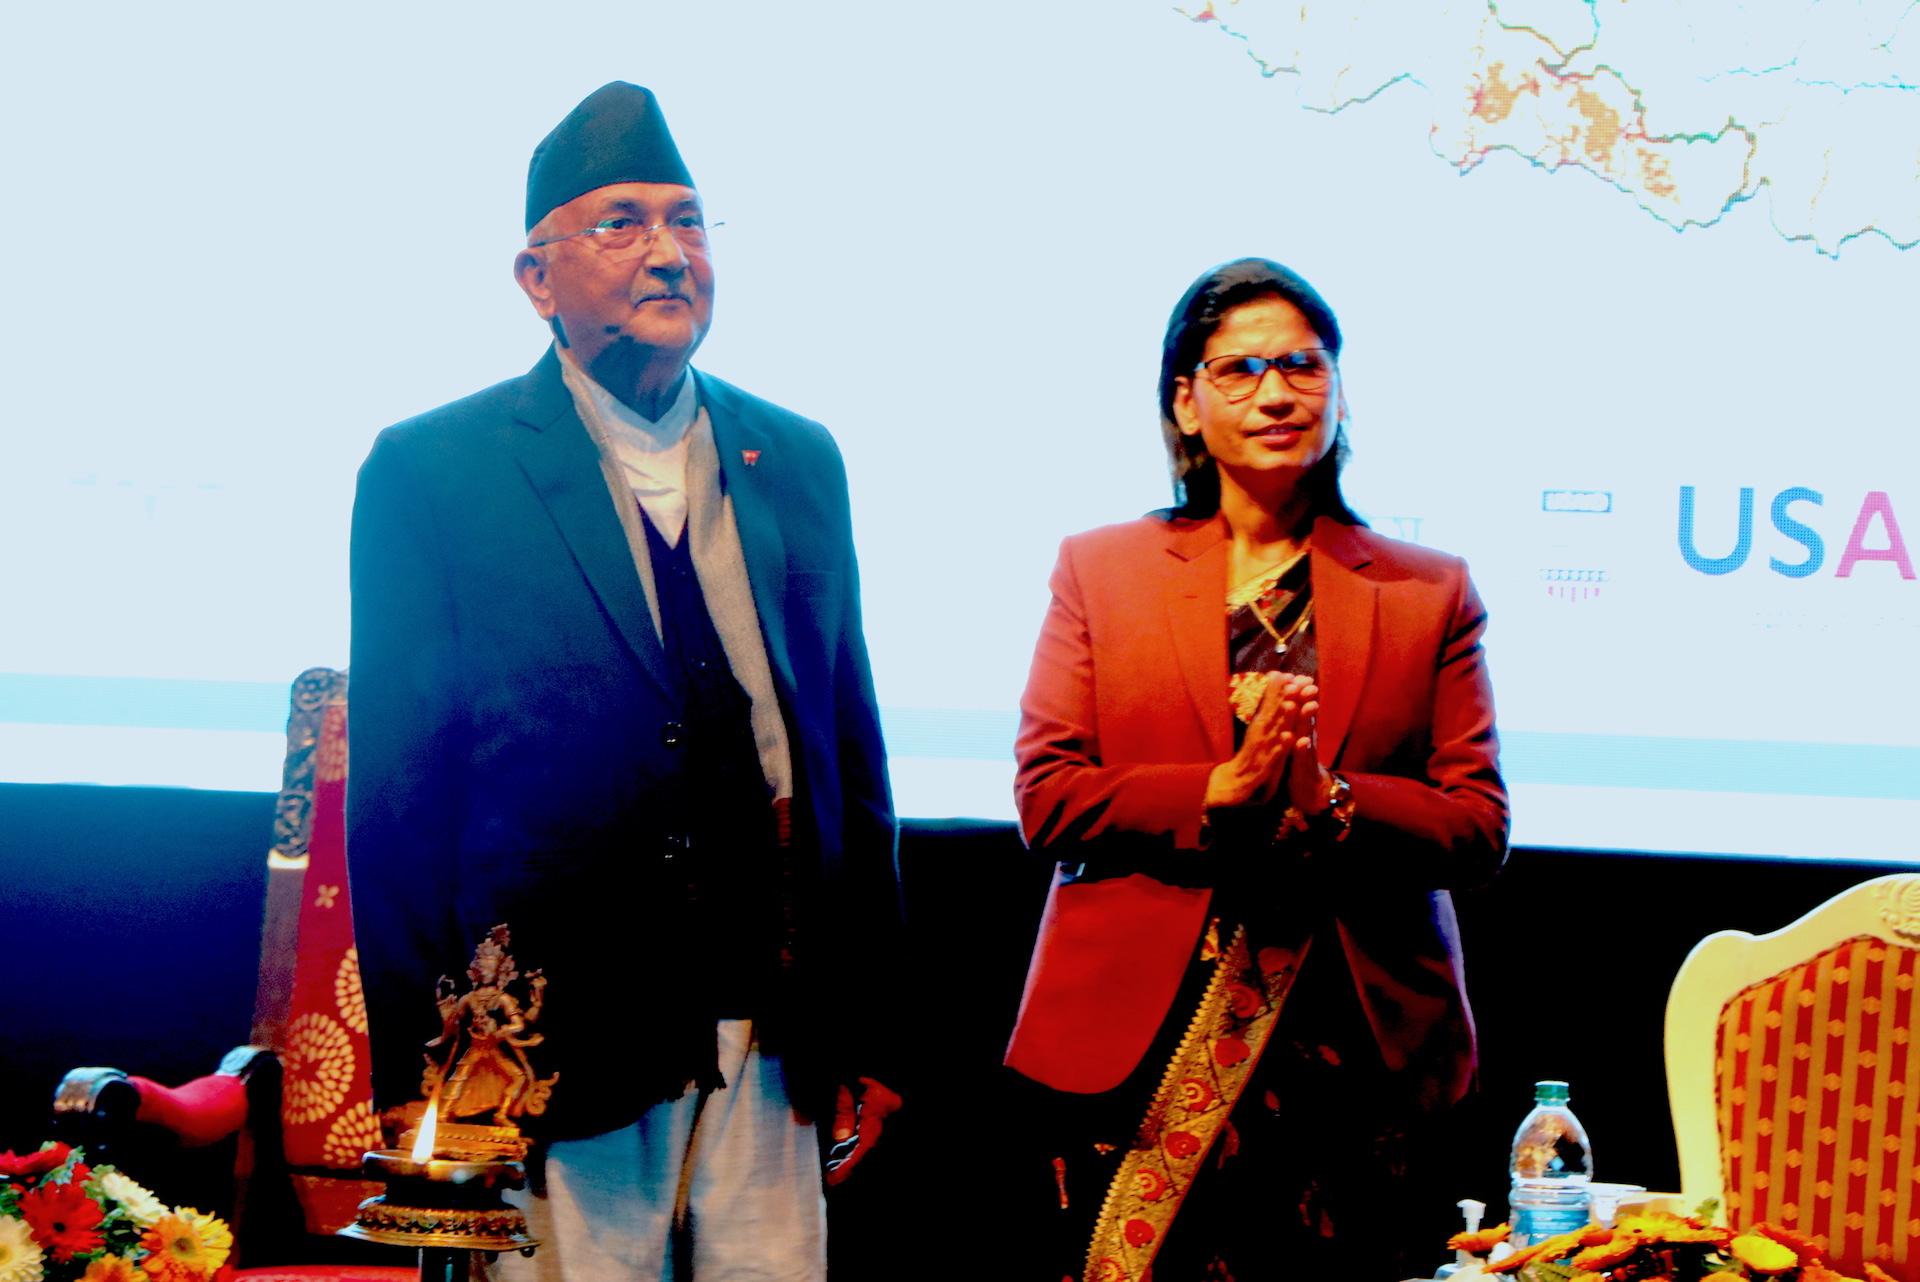 K.P. Sharma Oli (left), Prime Minister of Nepal, and Padma Kumari Aryal, Minister of Agriculture and Livestock Development, launch the digital soil map. (Photo: Shashish Maharjan/CIMMYT)